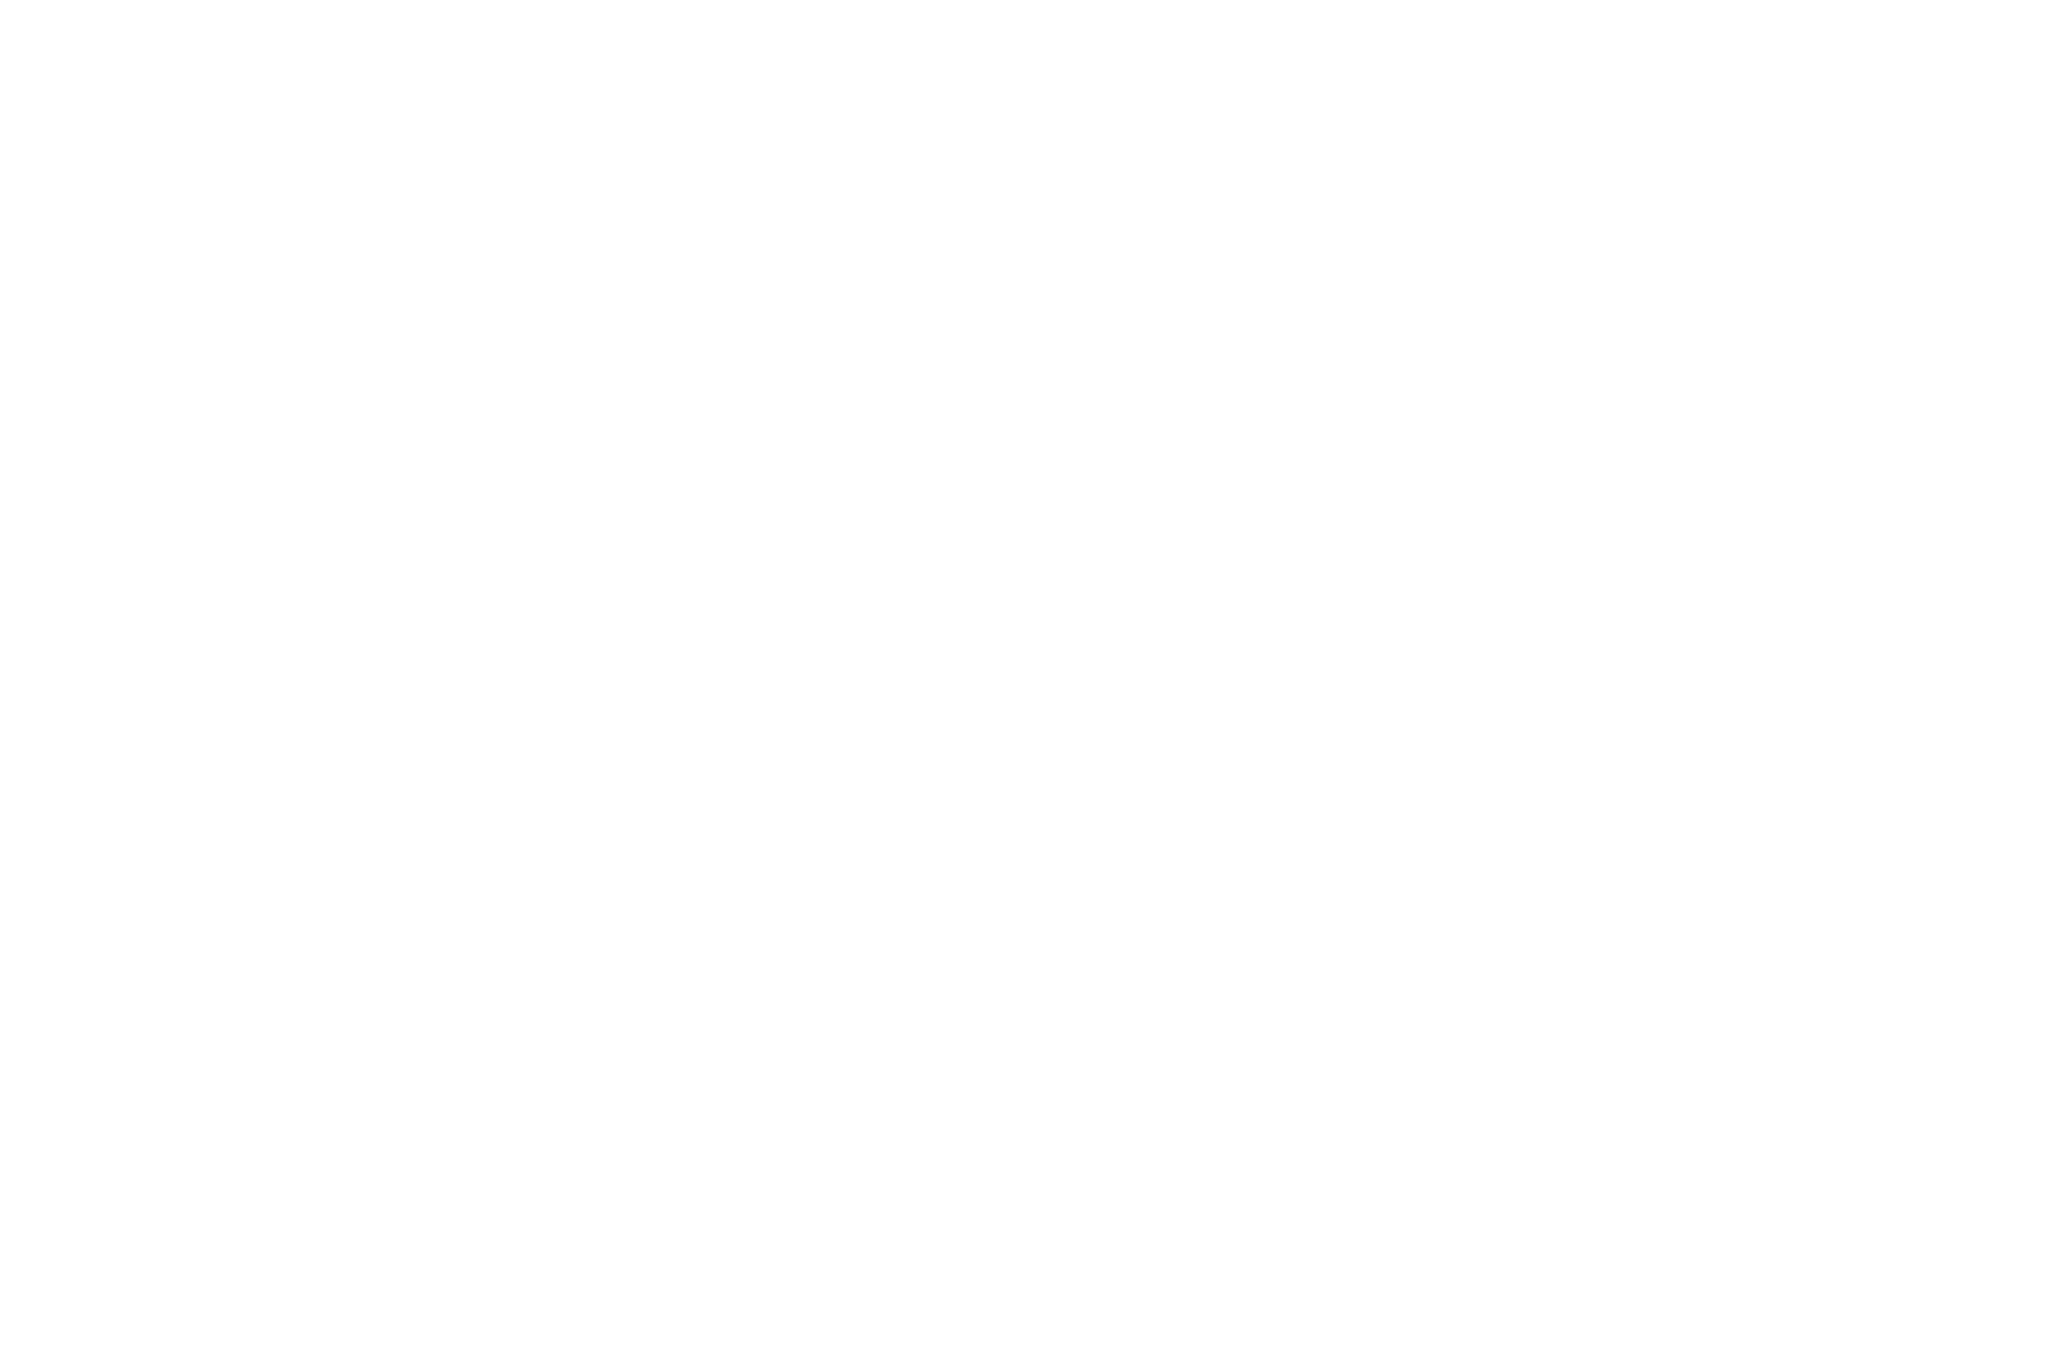 Paryse